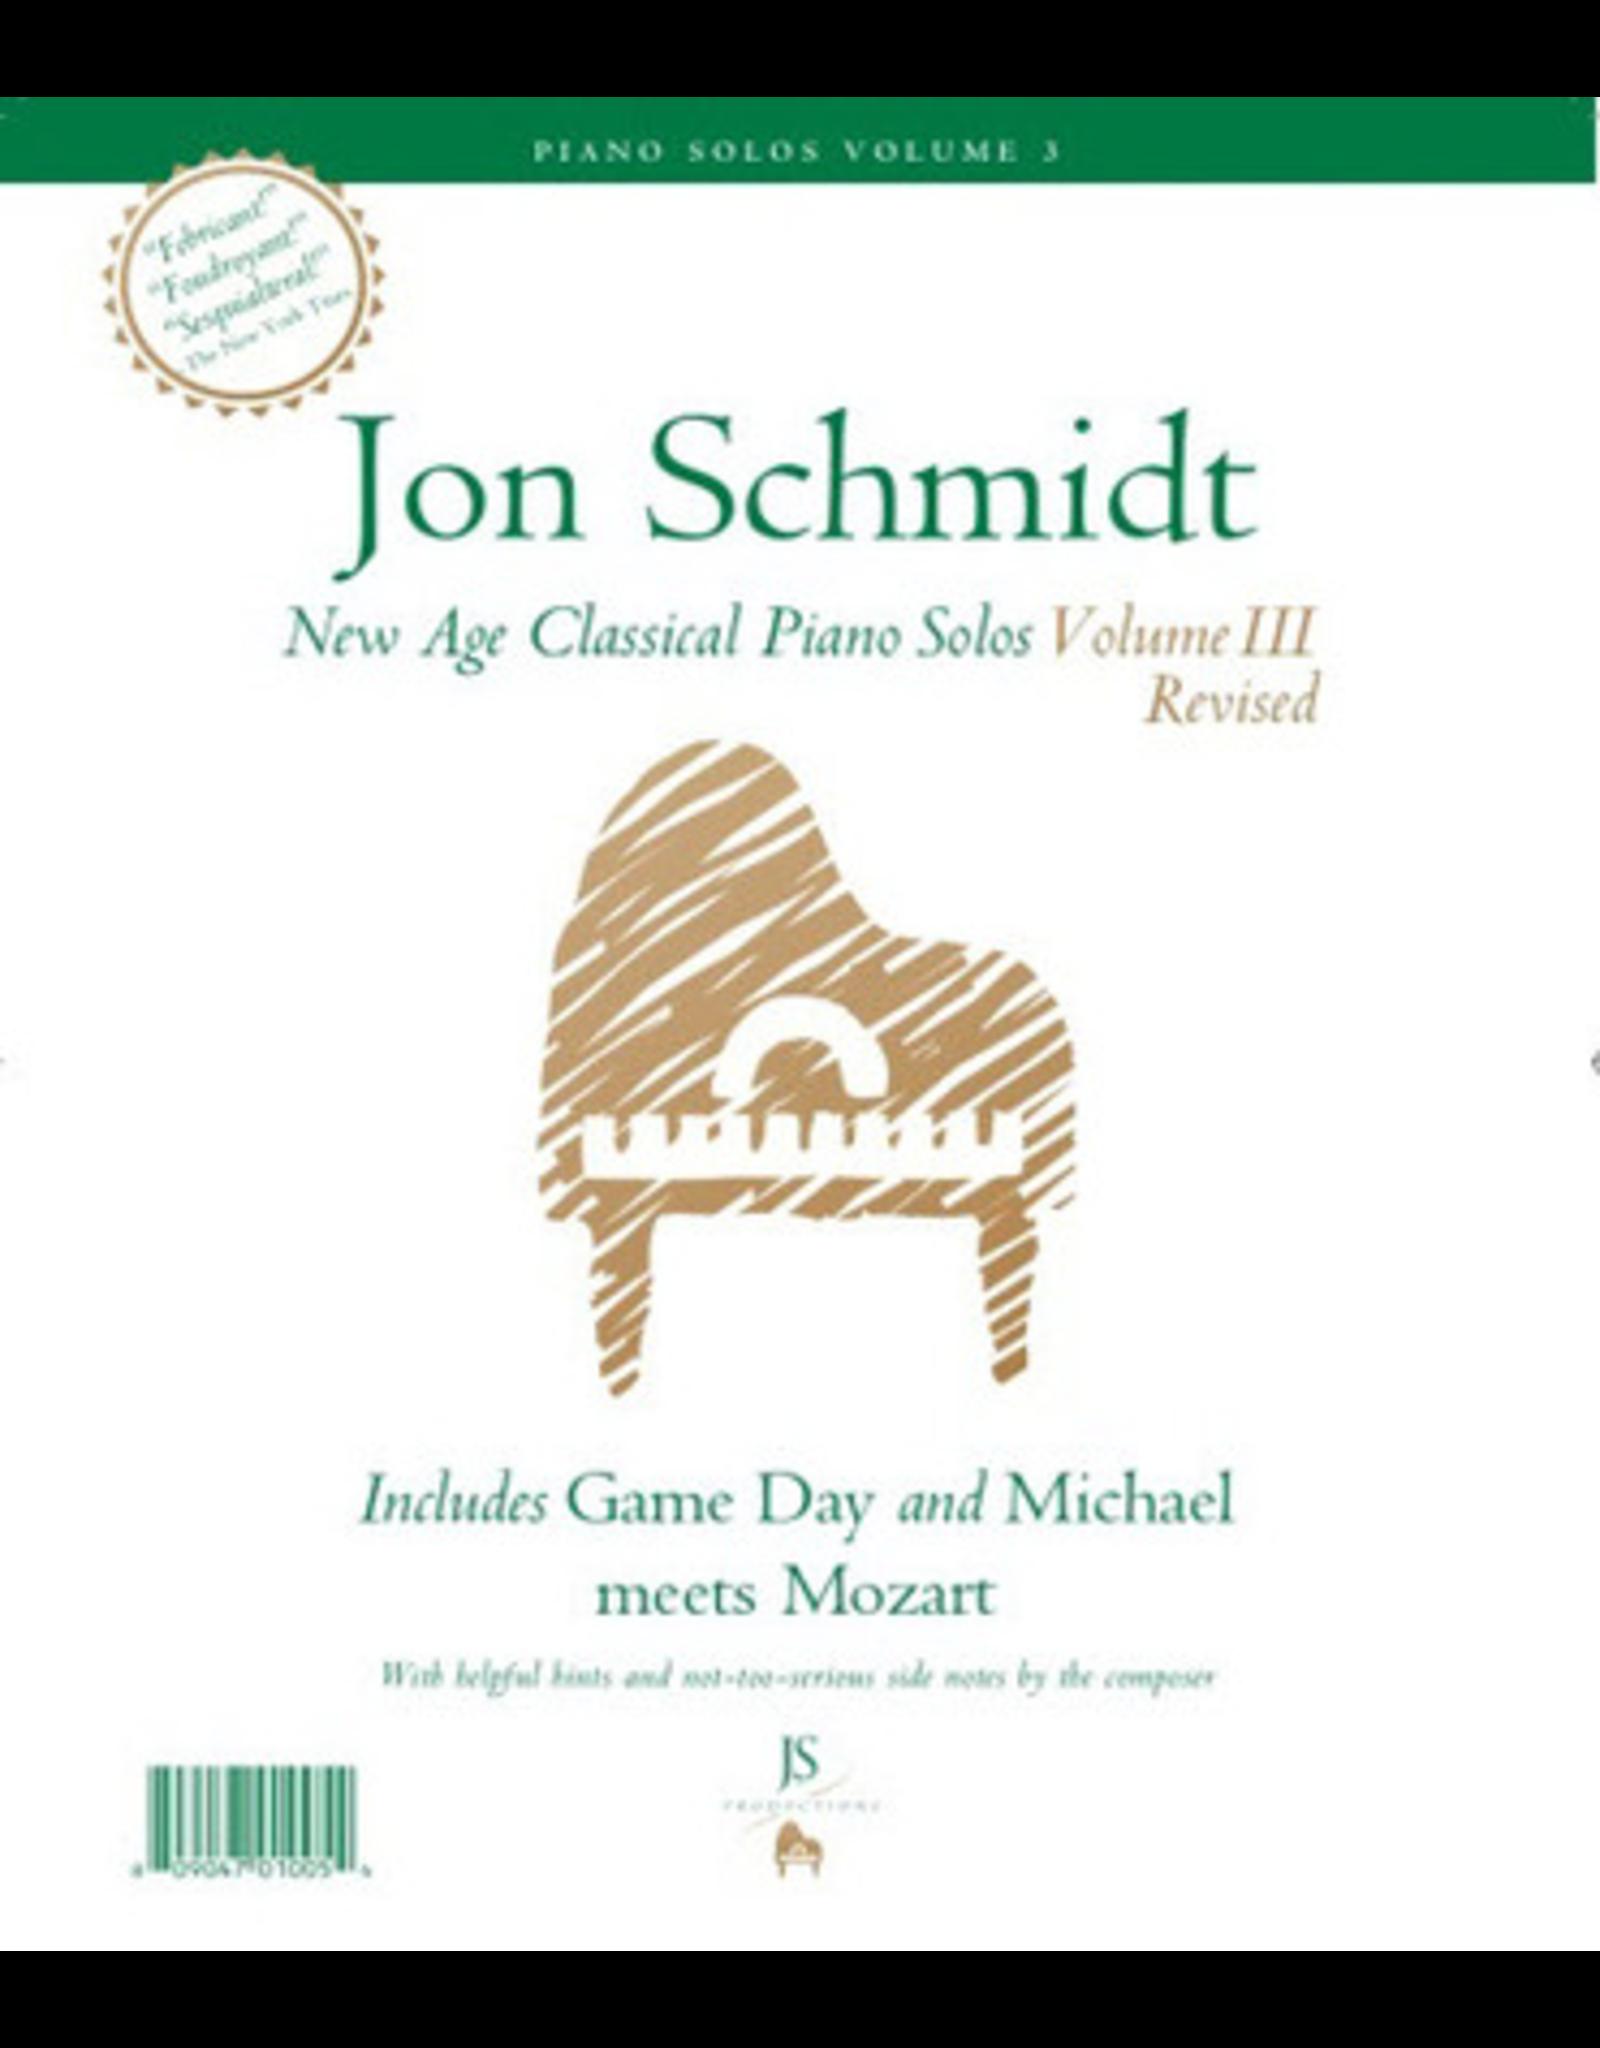 Jon Schmidt Music Jon Schmidt New Age Classical Piano Solos Volume 3